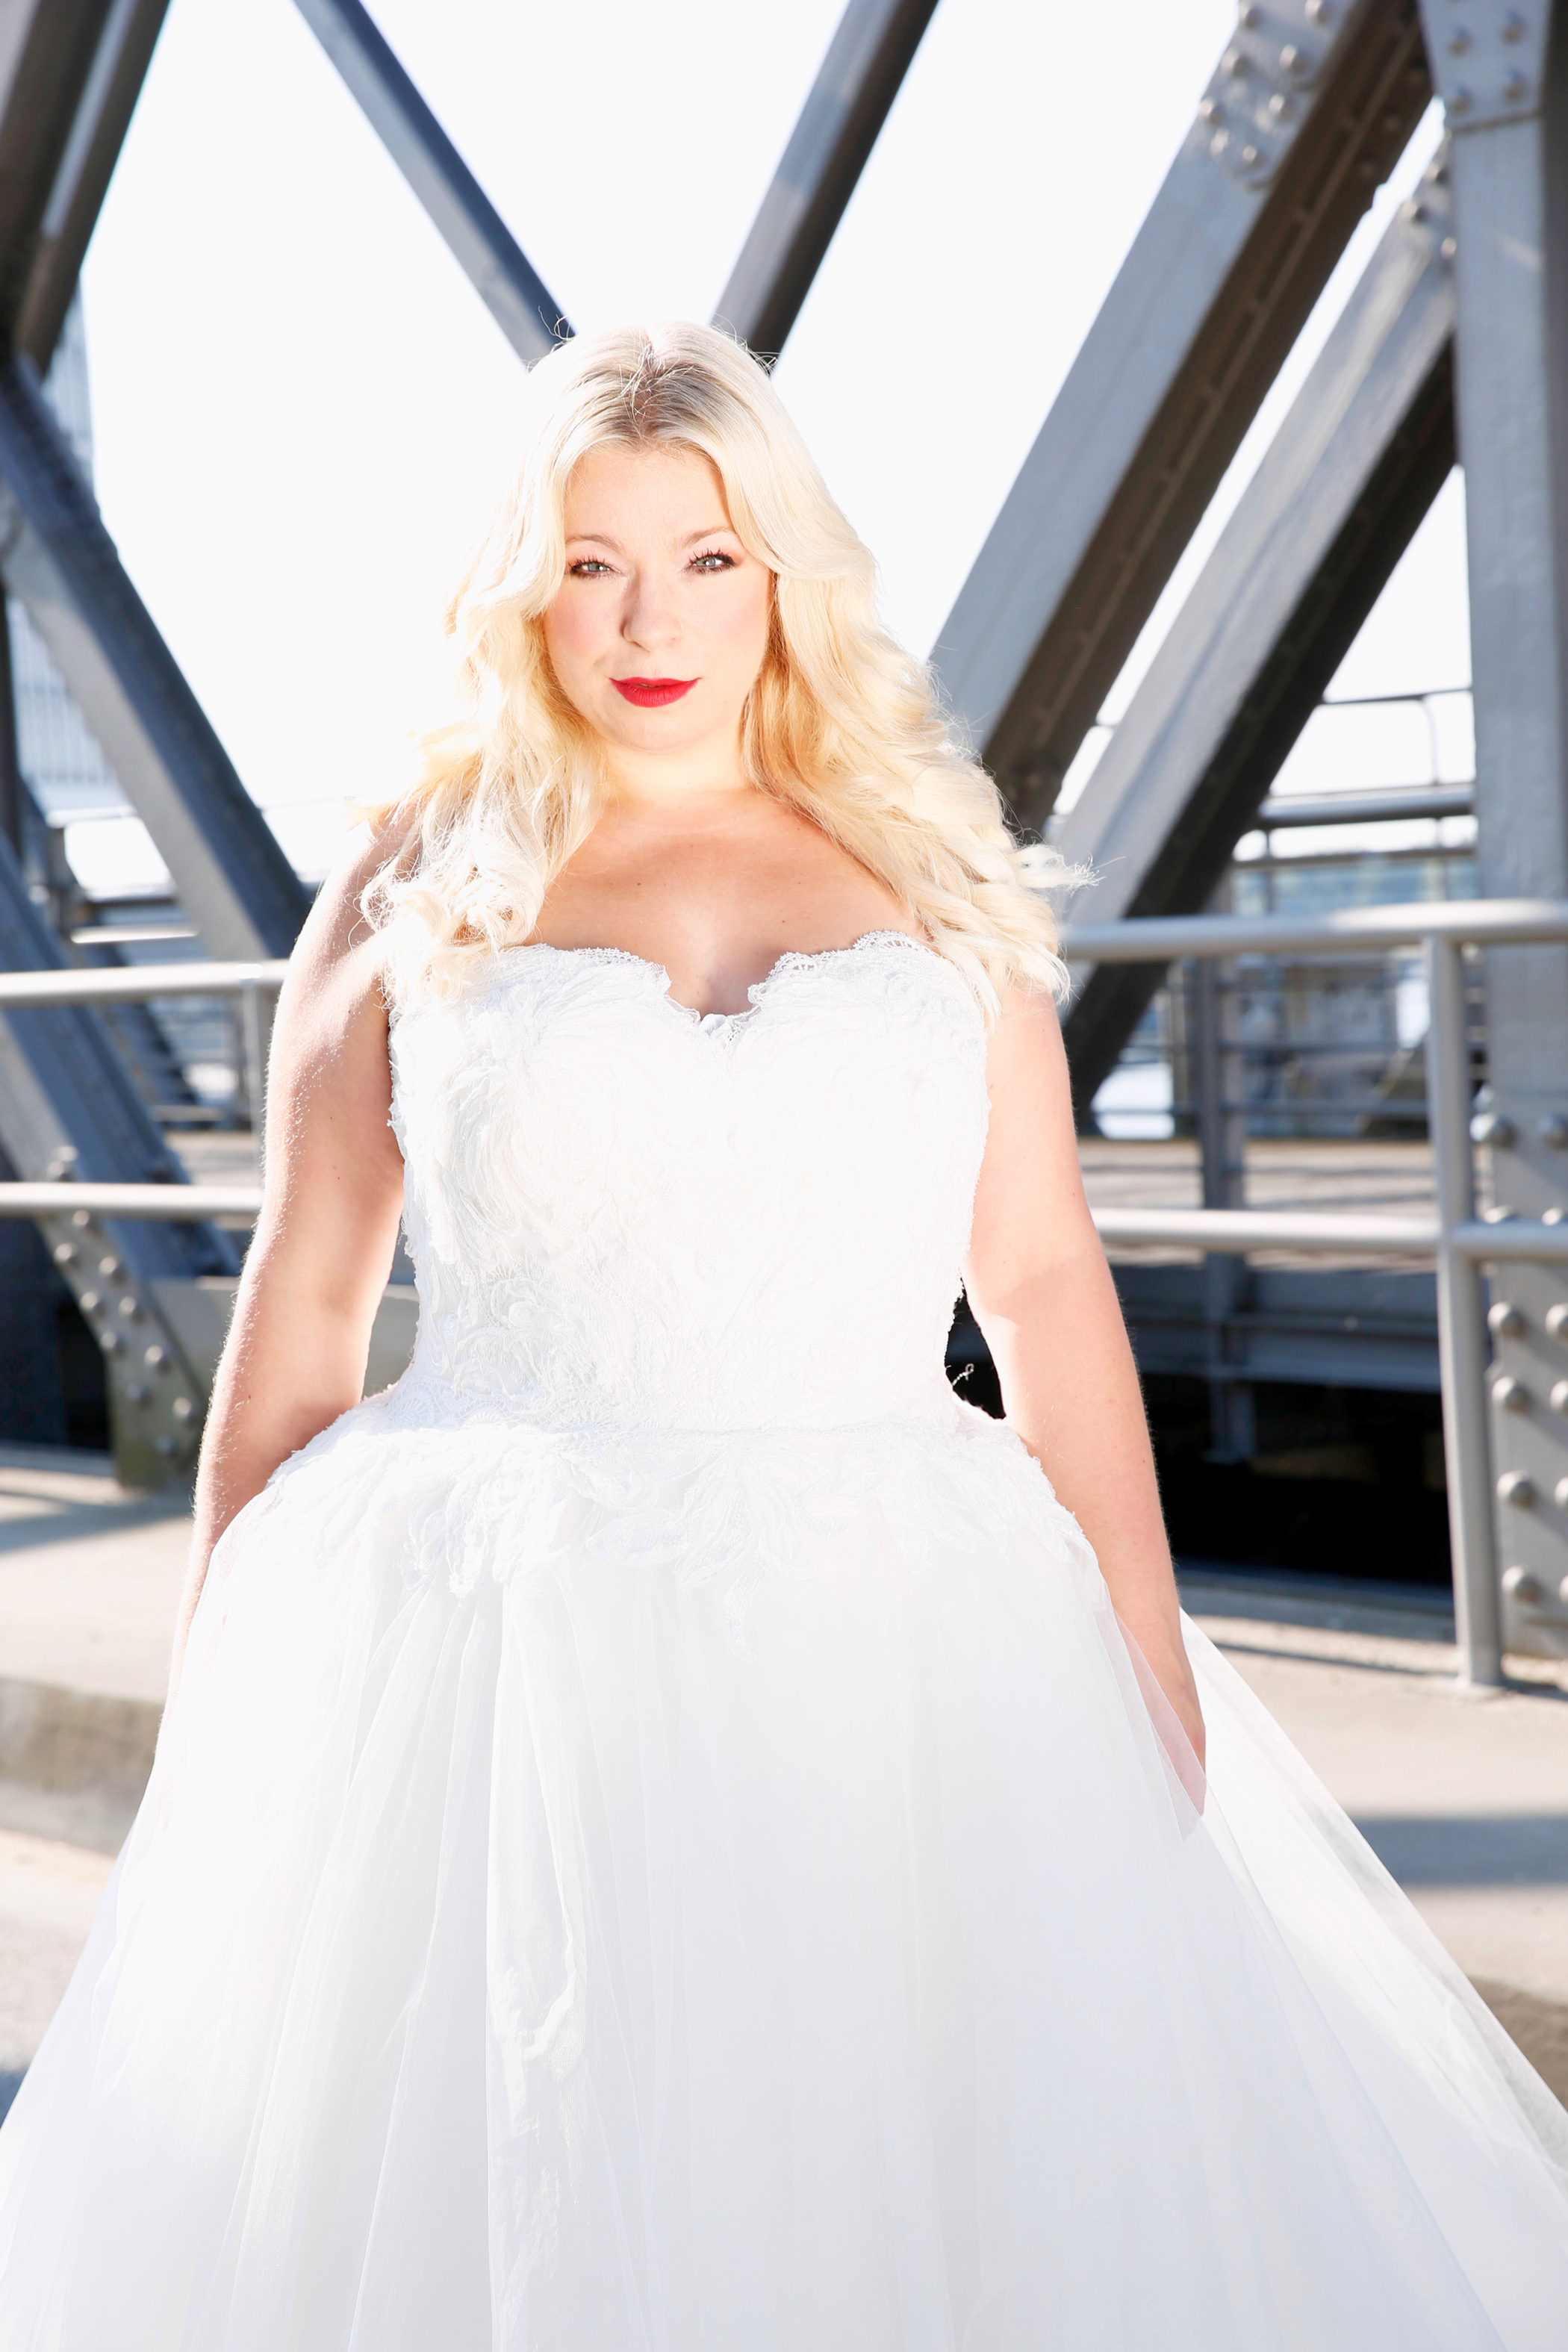 Caterina-pogorzelski-Megabambi-PLussizemodel-Bloggerin-Berlin-braut-plus-size-curvybraut